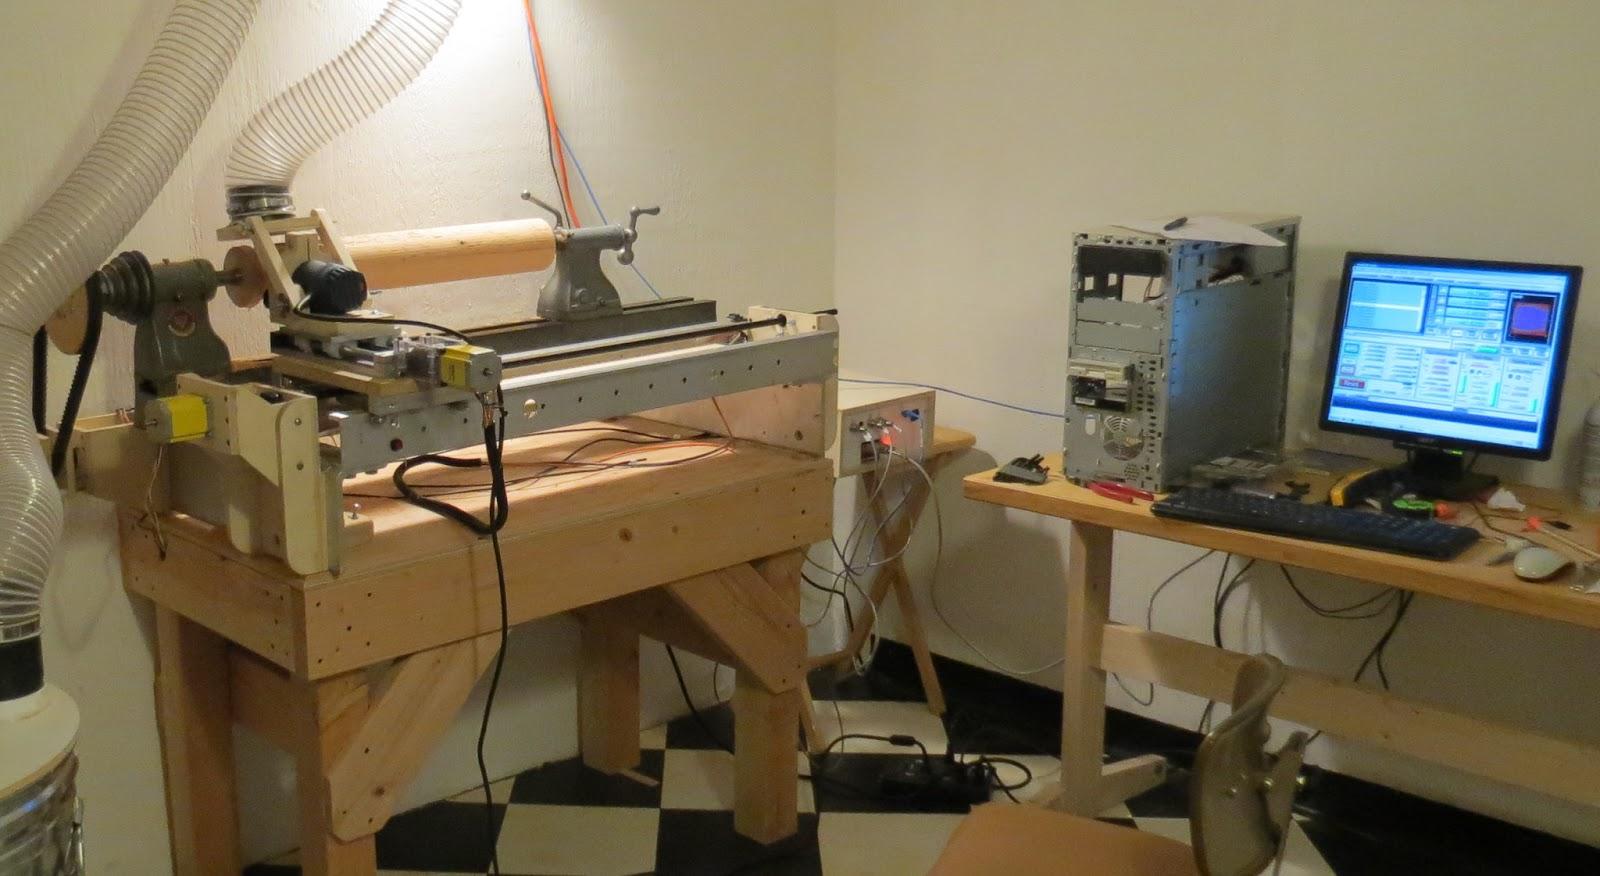 Woodworking build cnc wood lathe PDF Free Download